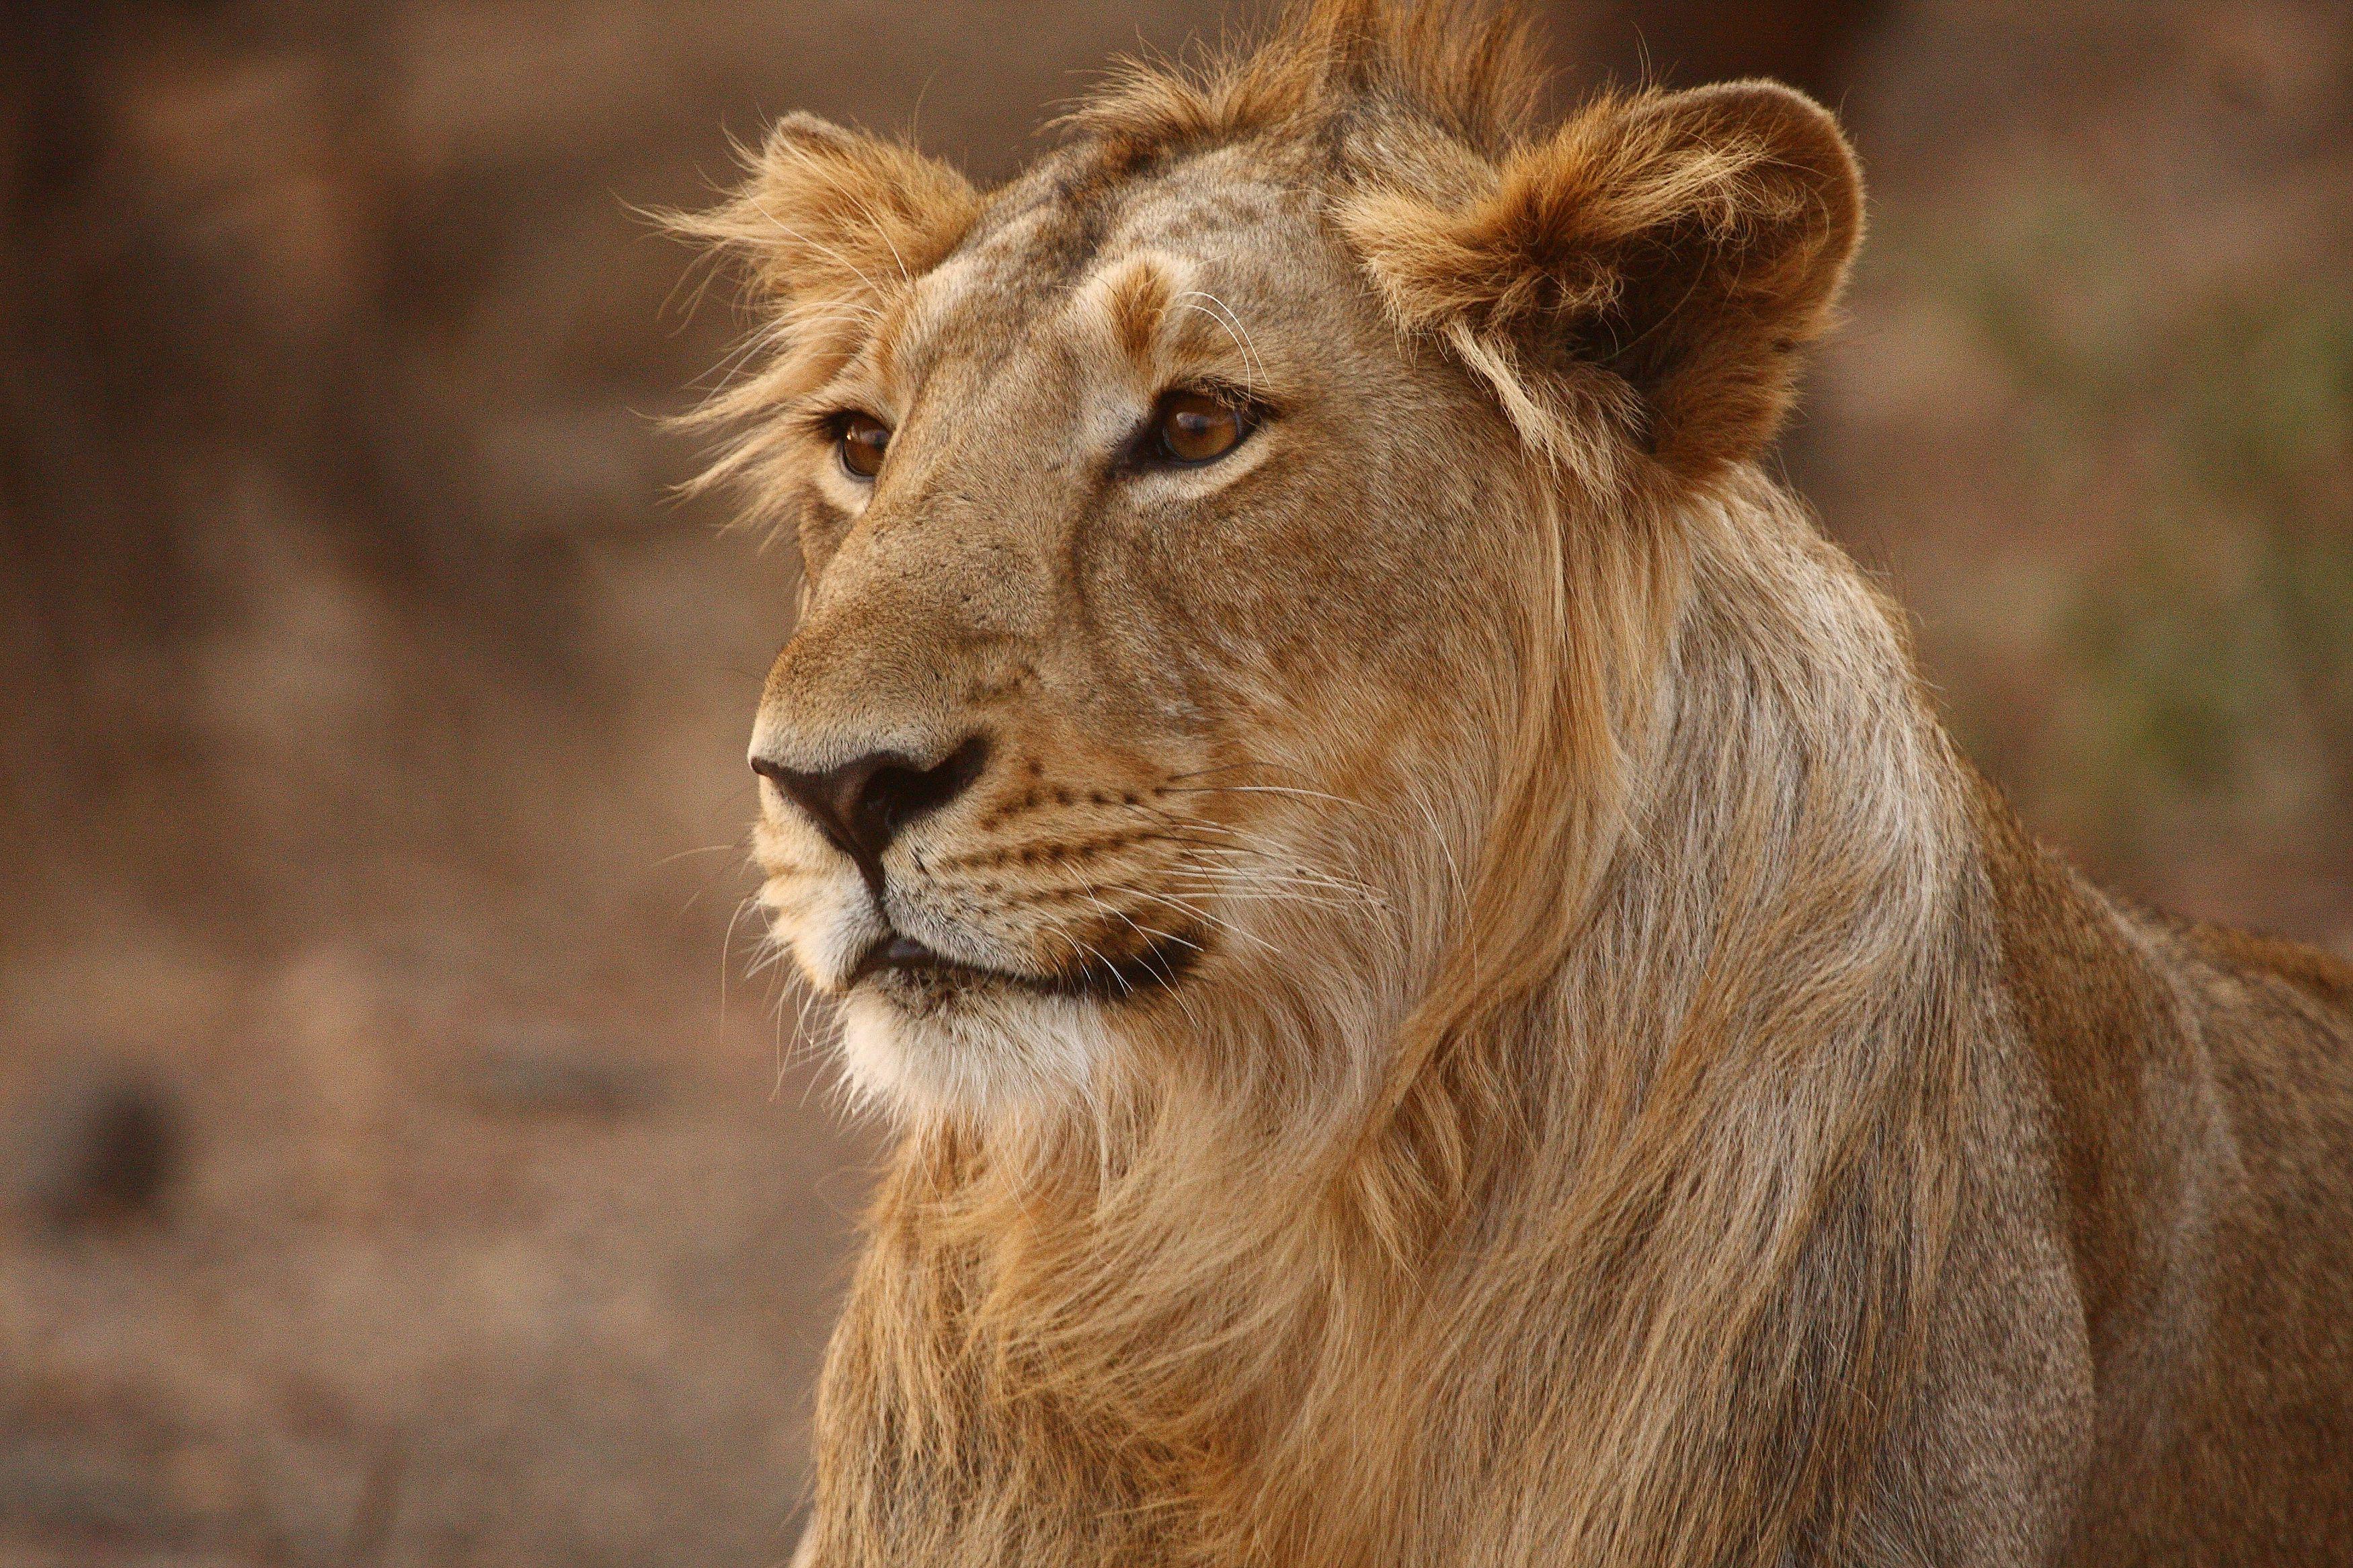 African Lion Facts Habitatt Behavior